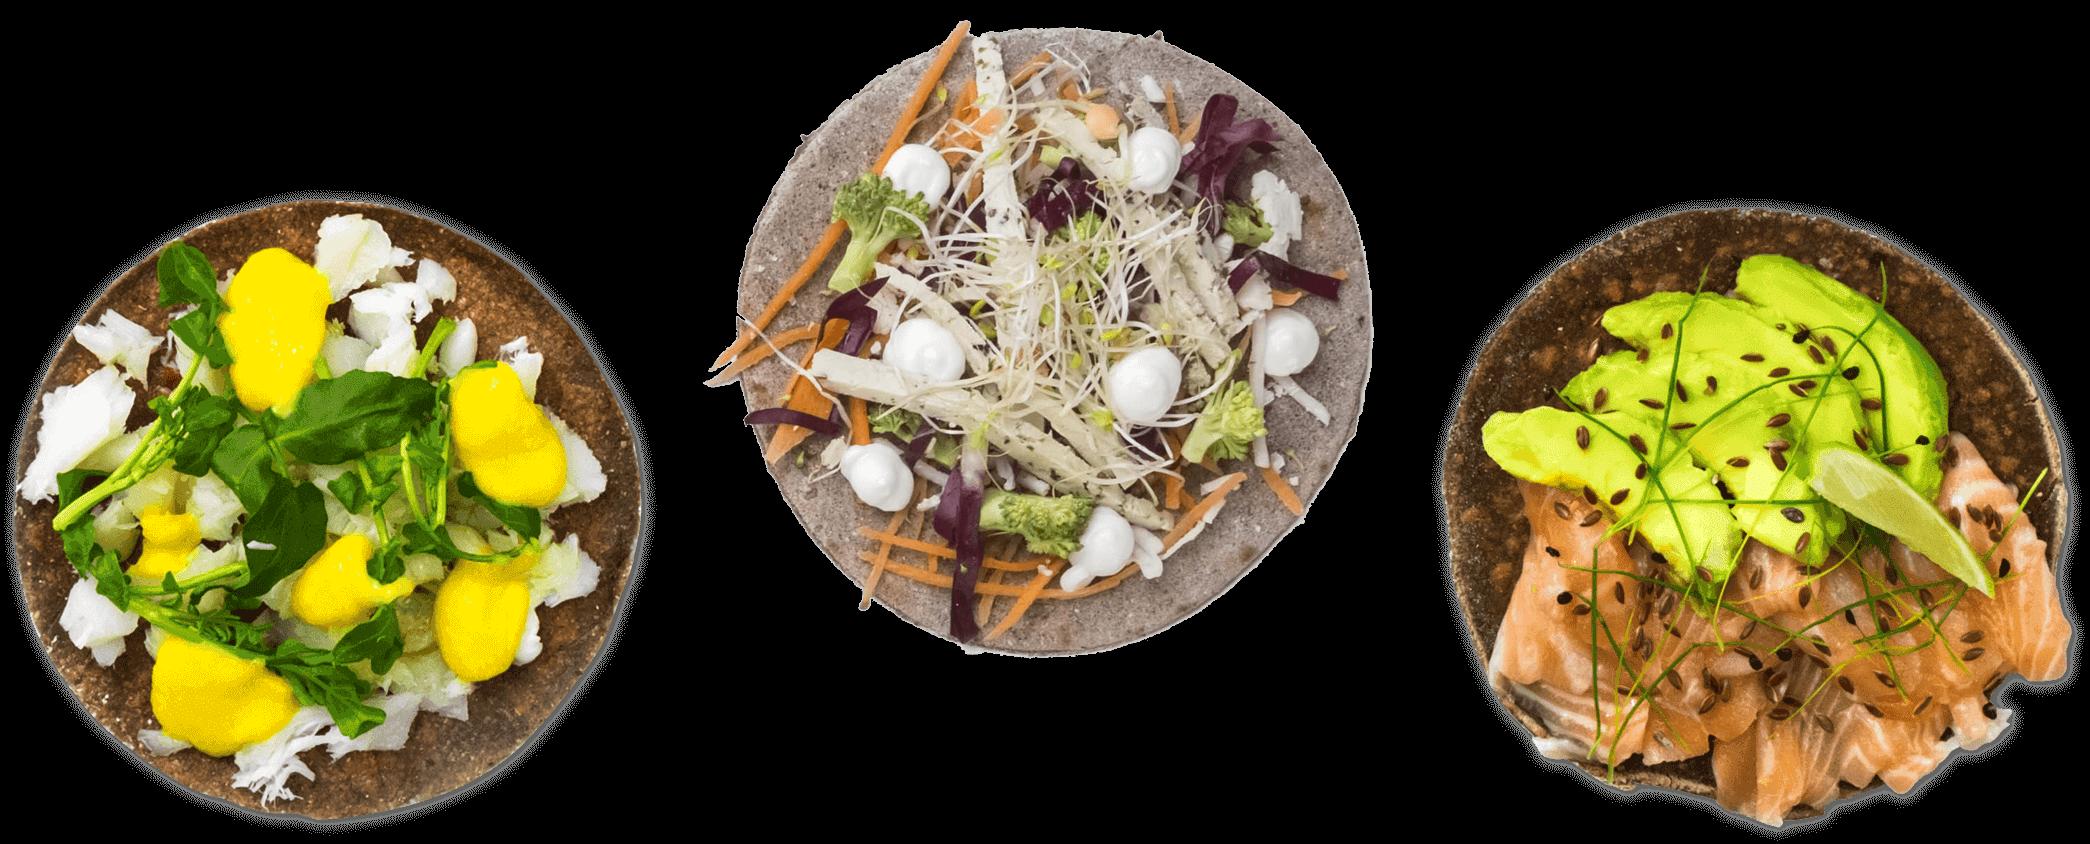 plato-chic-superfood-home-imgs-velo